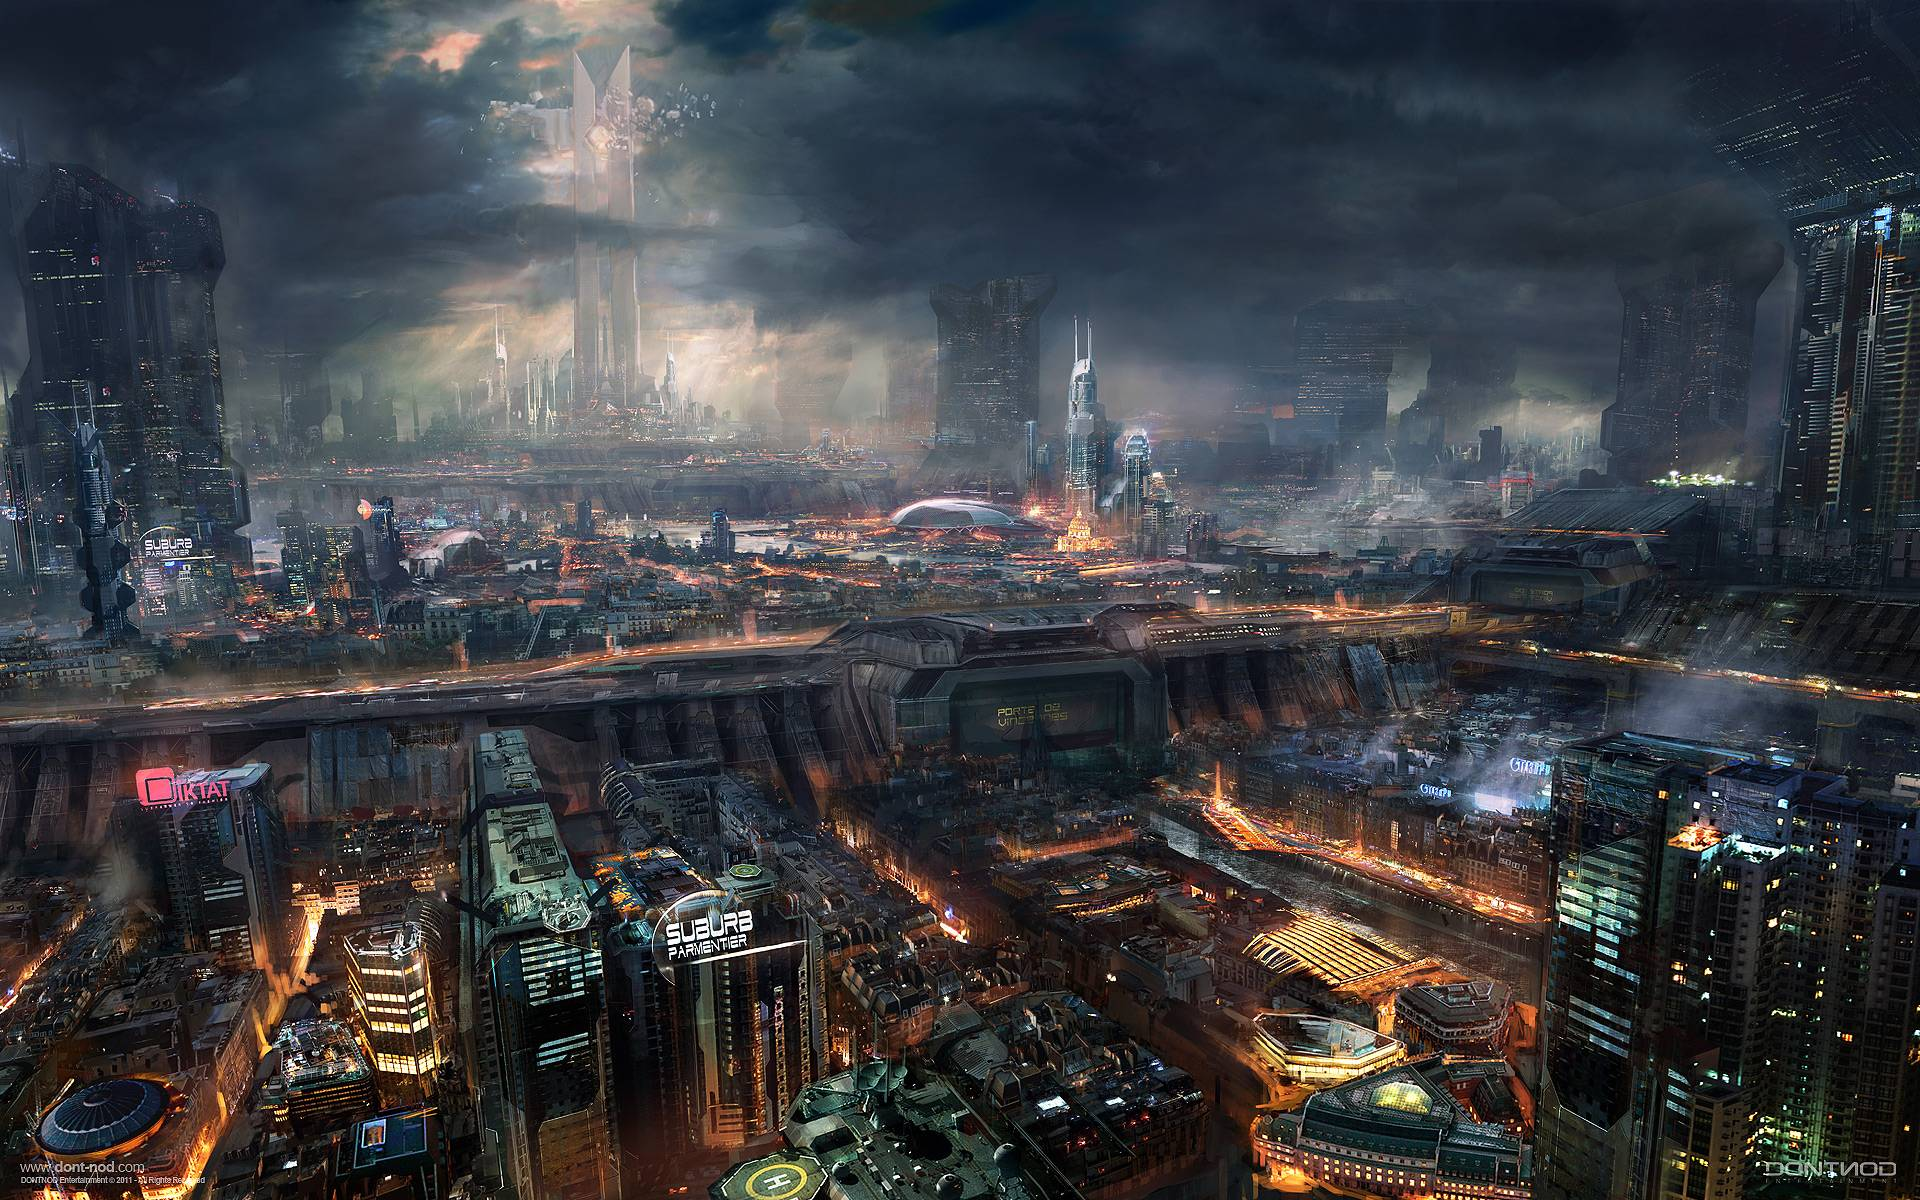 General 1920x1200 science fiction cyberpunk Remember Me futuristic concept art detailed futuristic city artwork video games digital art cityscape